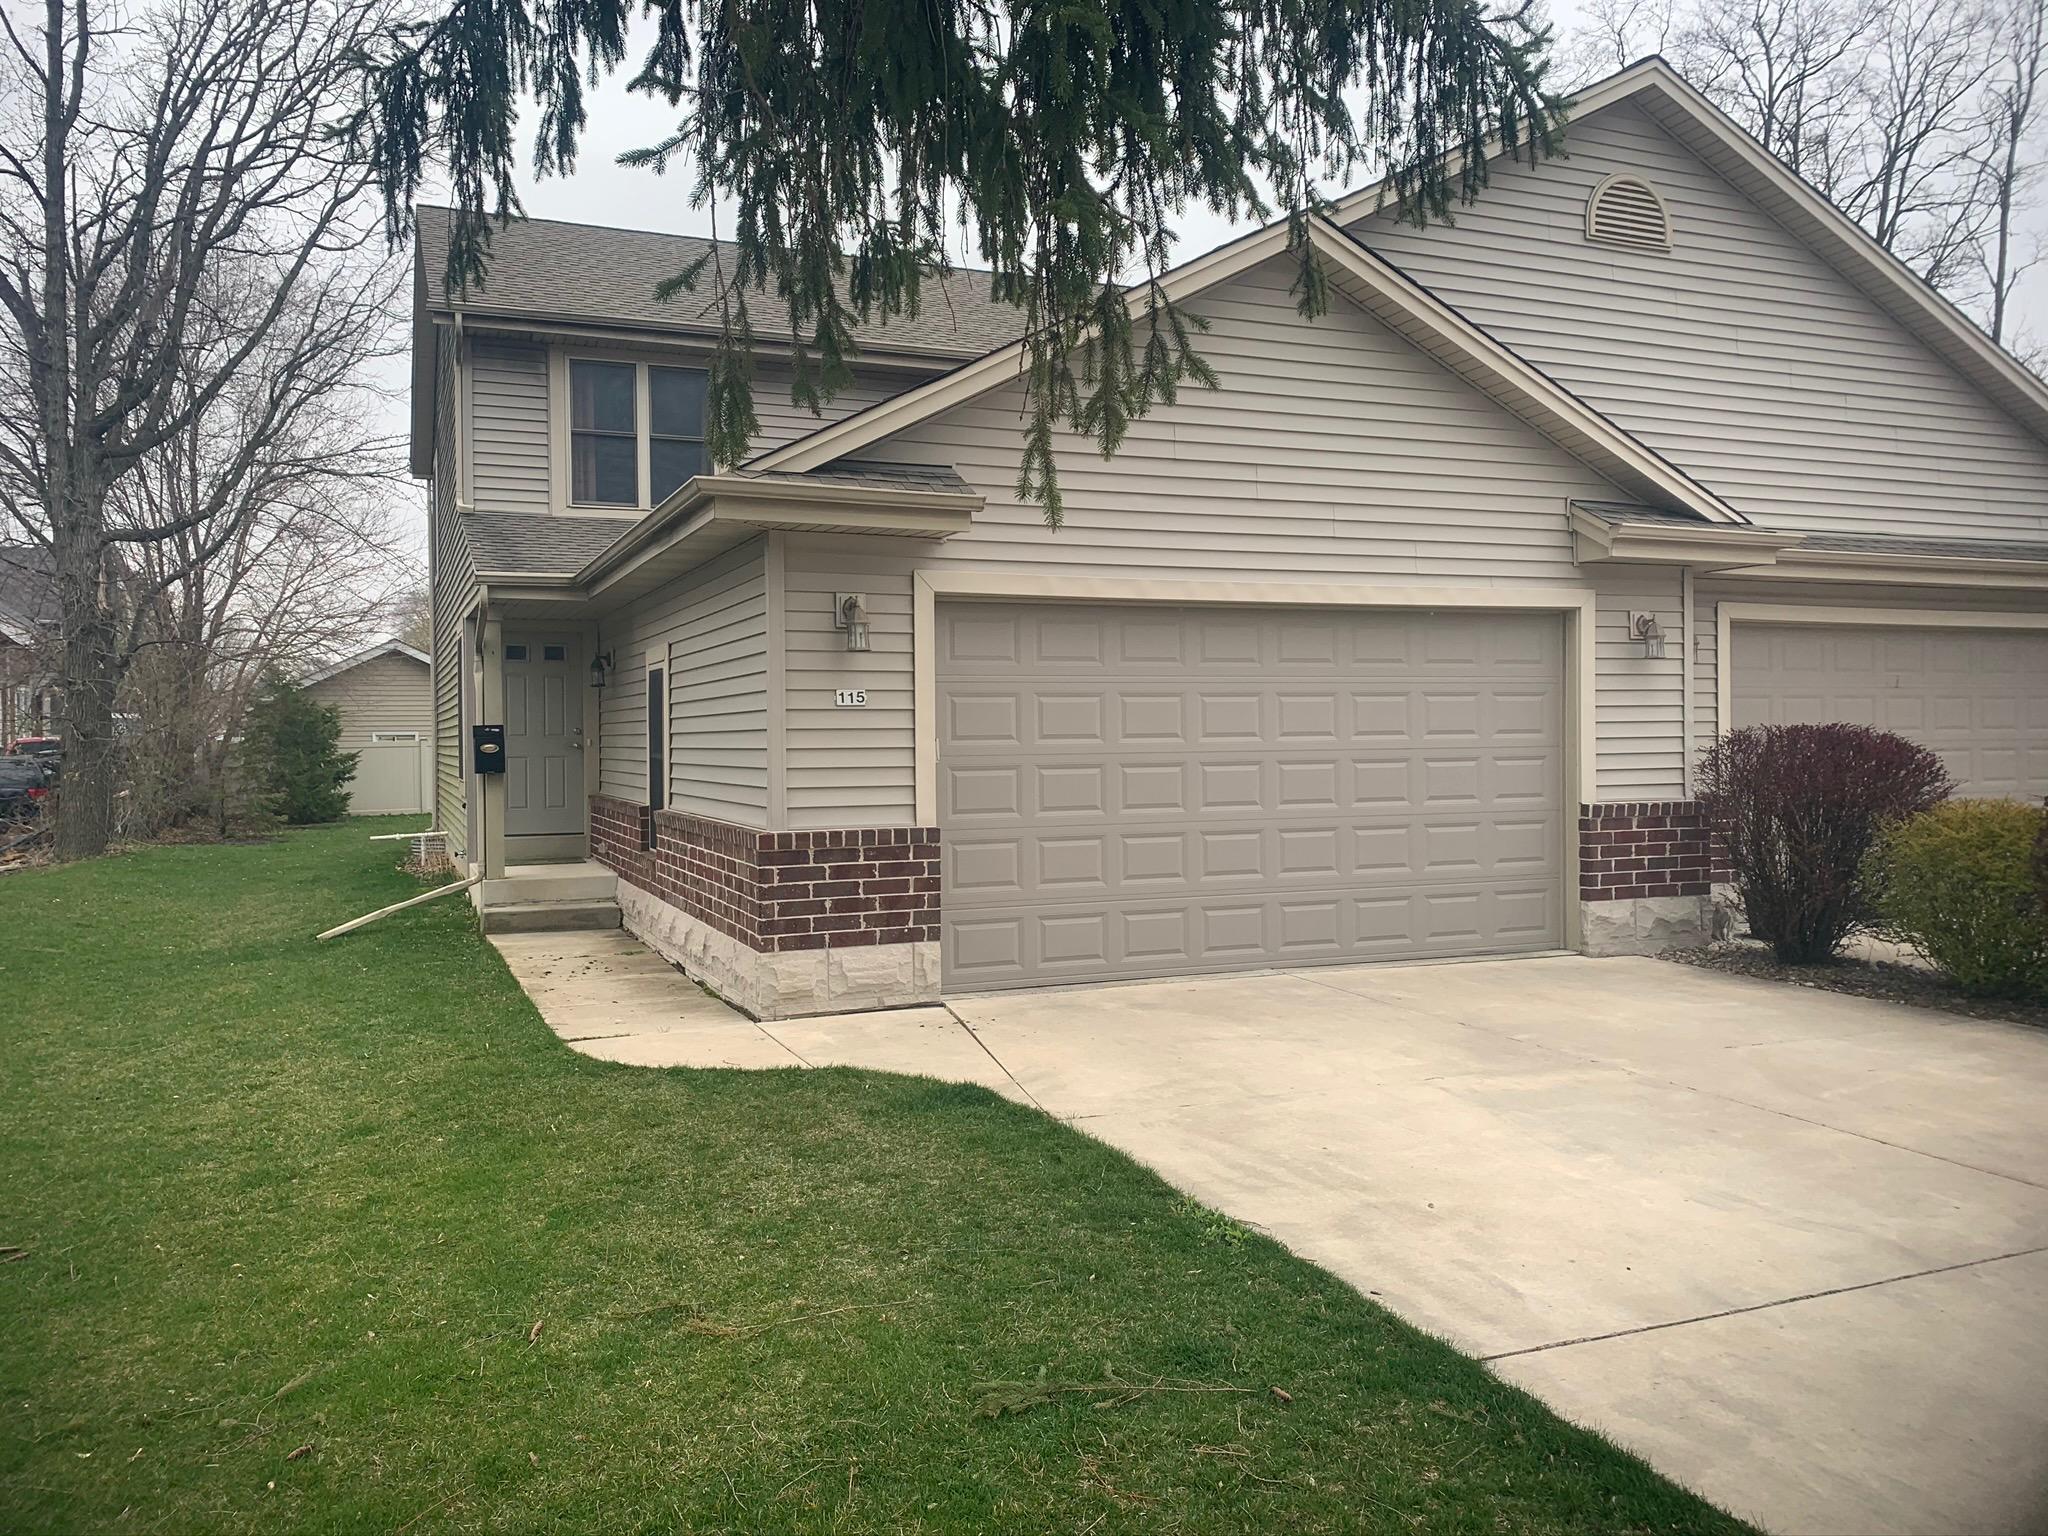 115 3rd St, Waterford, Wisconsin 53185, 3 Bedrooms Bedrooms, 5 Rooms Rooms,2 BathroomsBathrooms,Condominiums,For Sale,3rd St,1,1687542